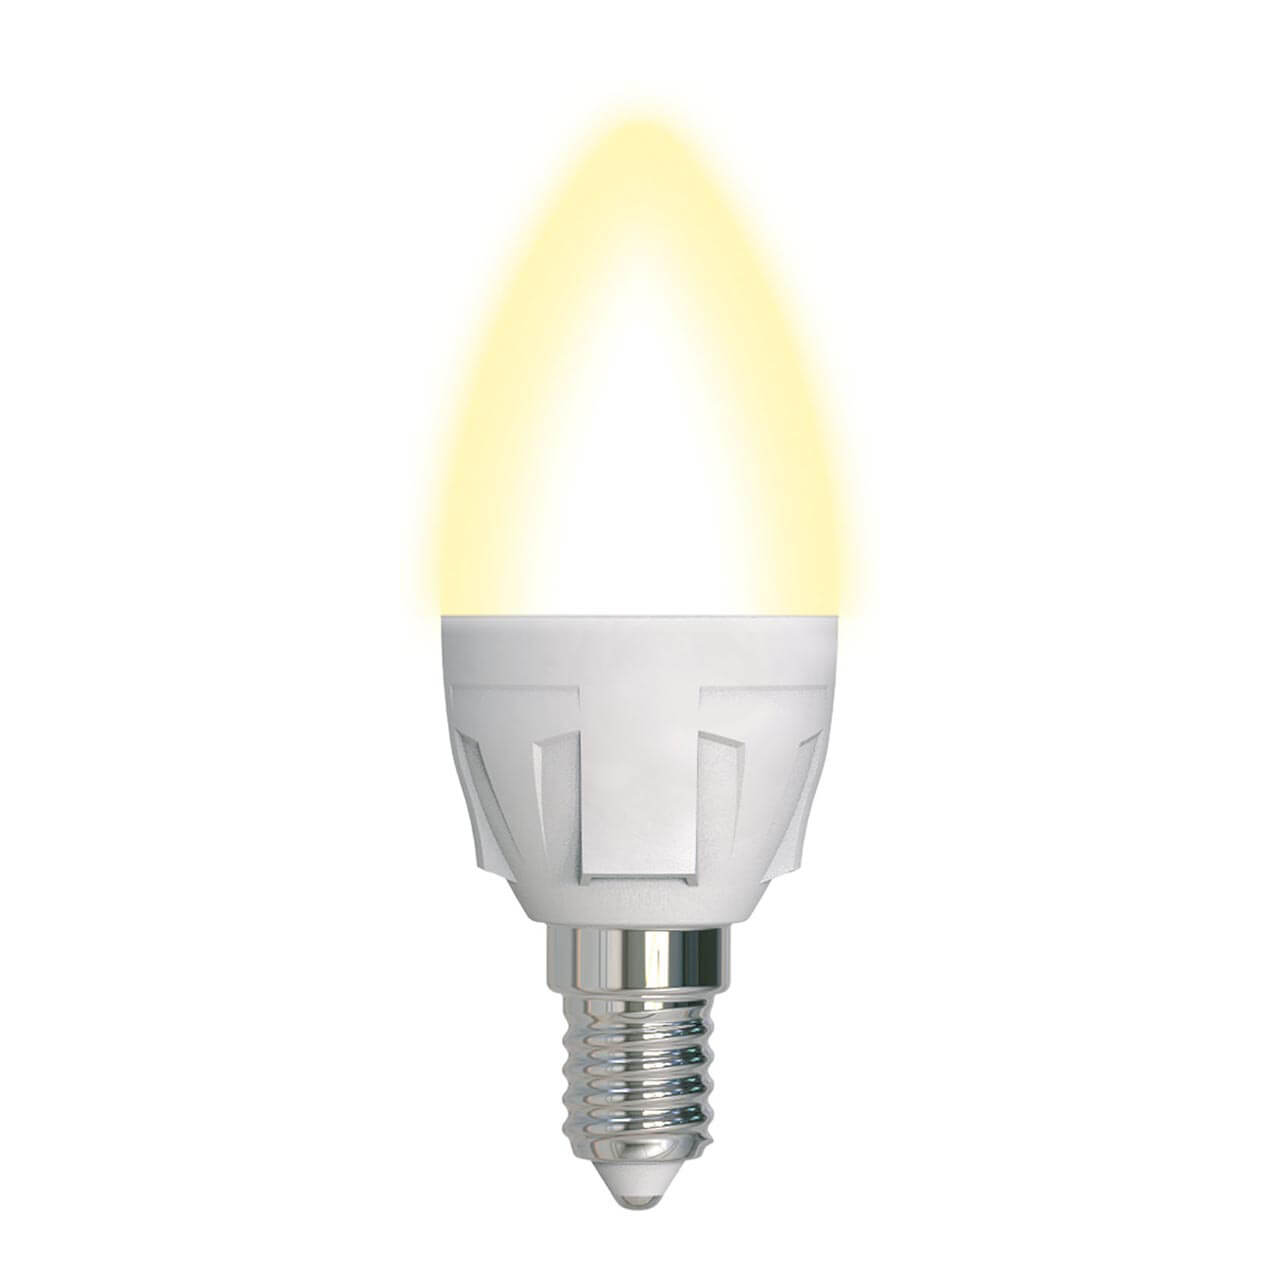 Лампочка Uniel LED-C37 7W/3000K/E14/FR/DIM PLP01WH Яркая (Диммирование) фото